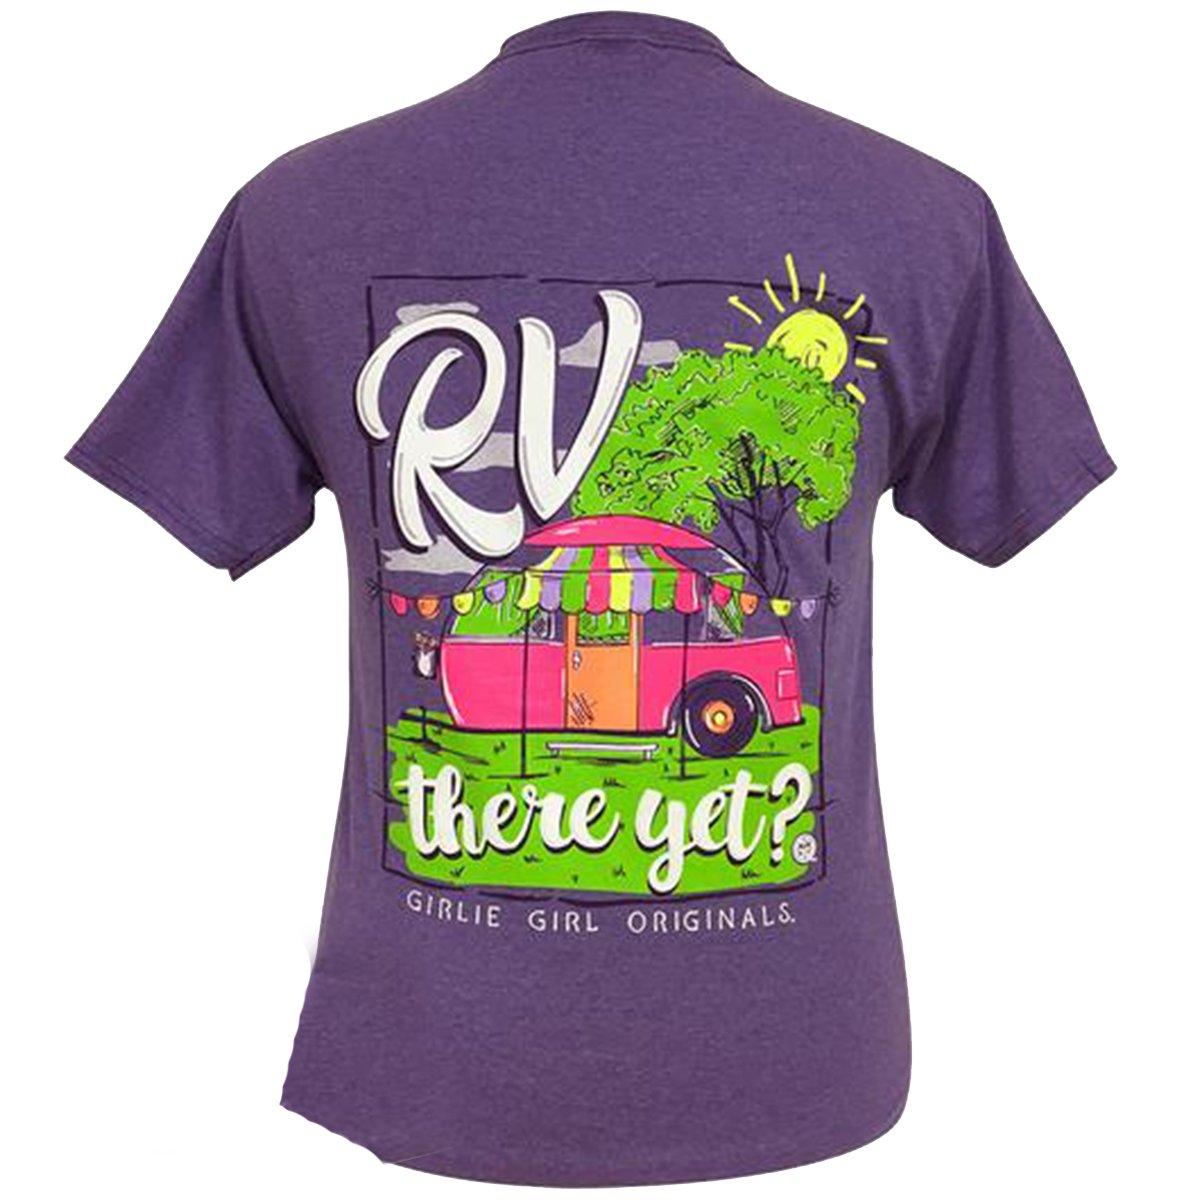 Girlie Girl Originals Youth RV There Yet Short Sleeve T-Shirt-Heather Purple-Medium